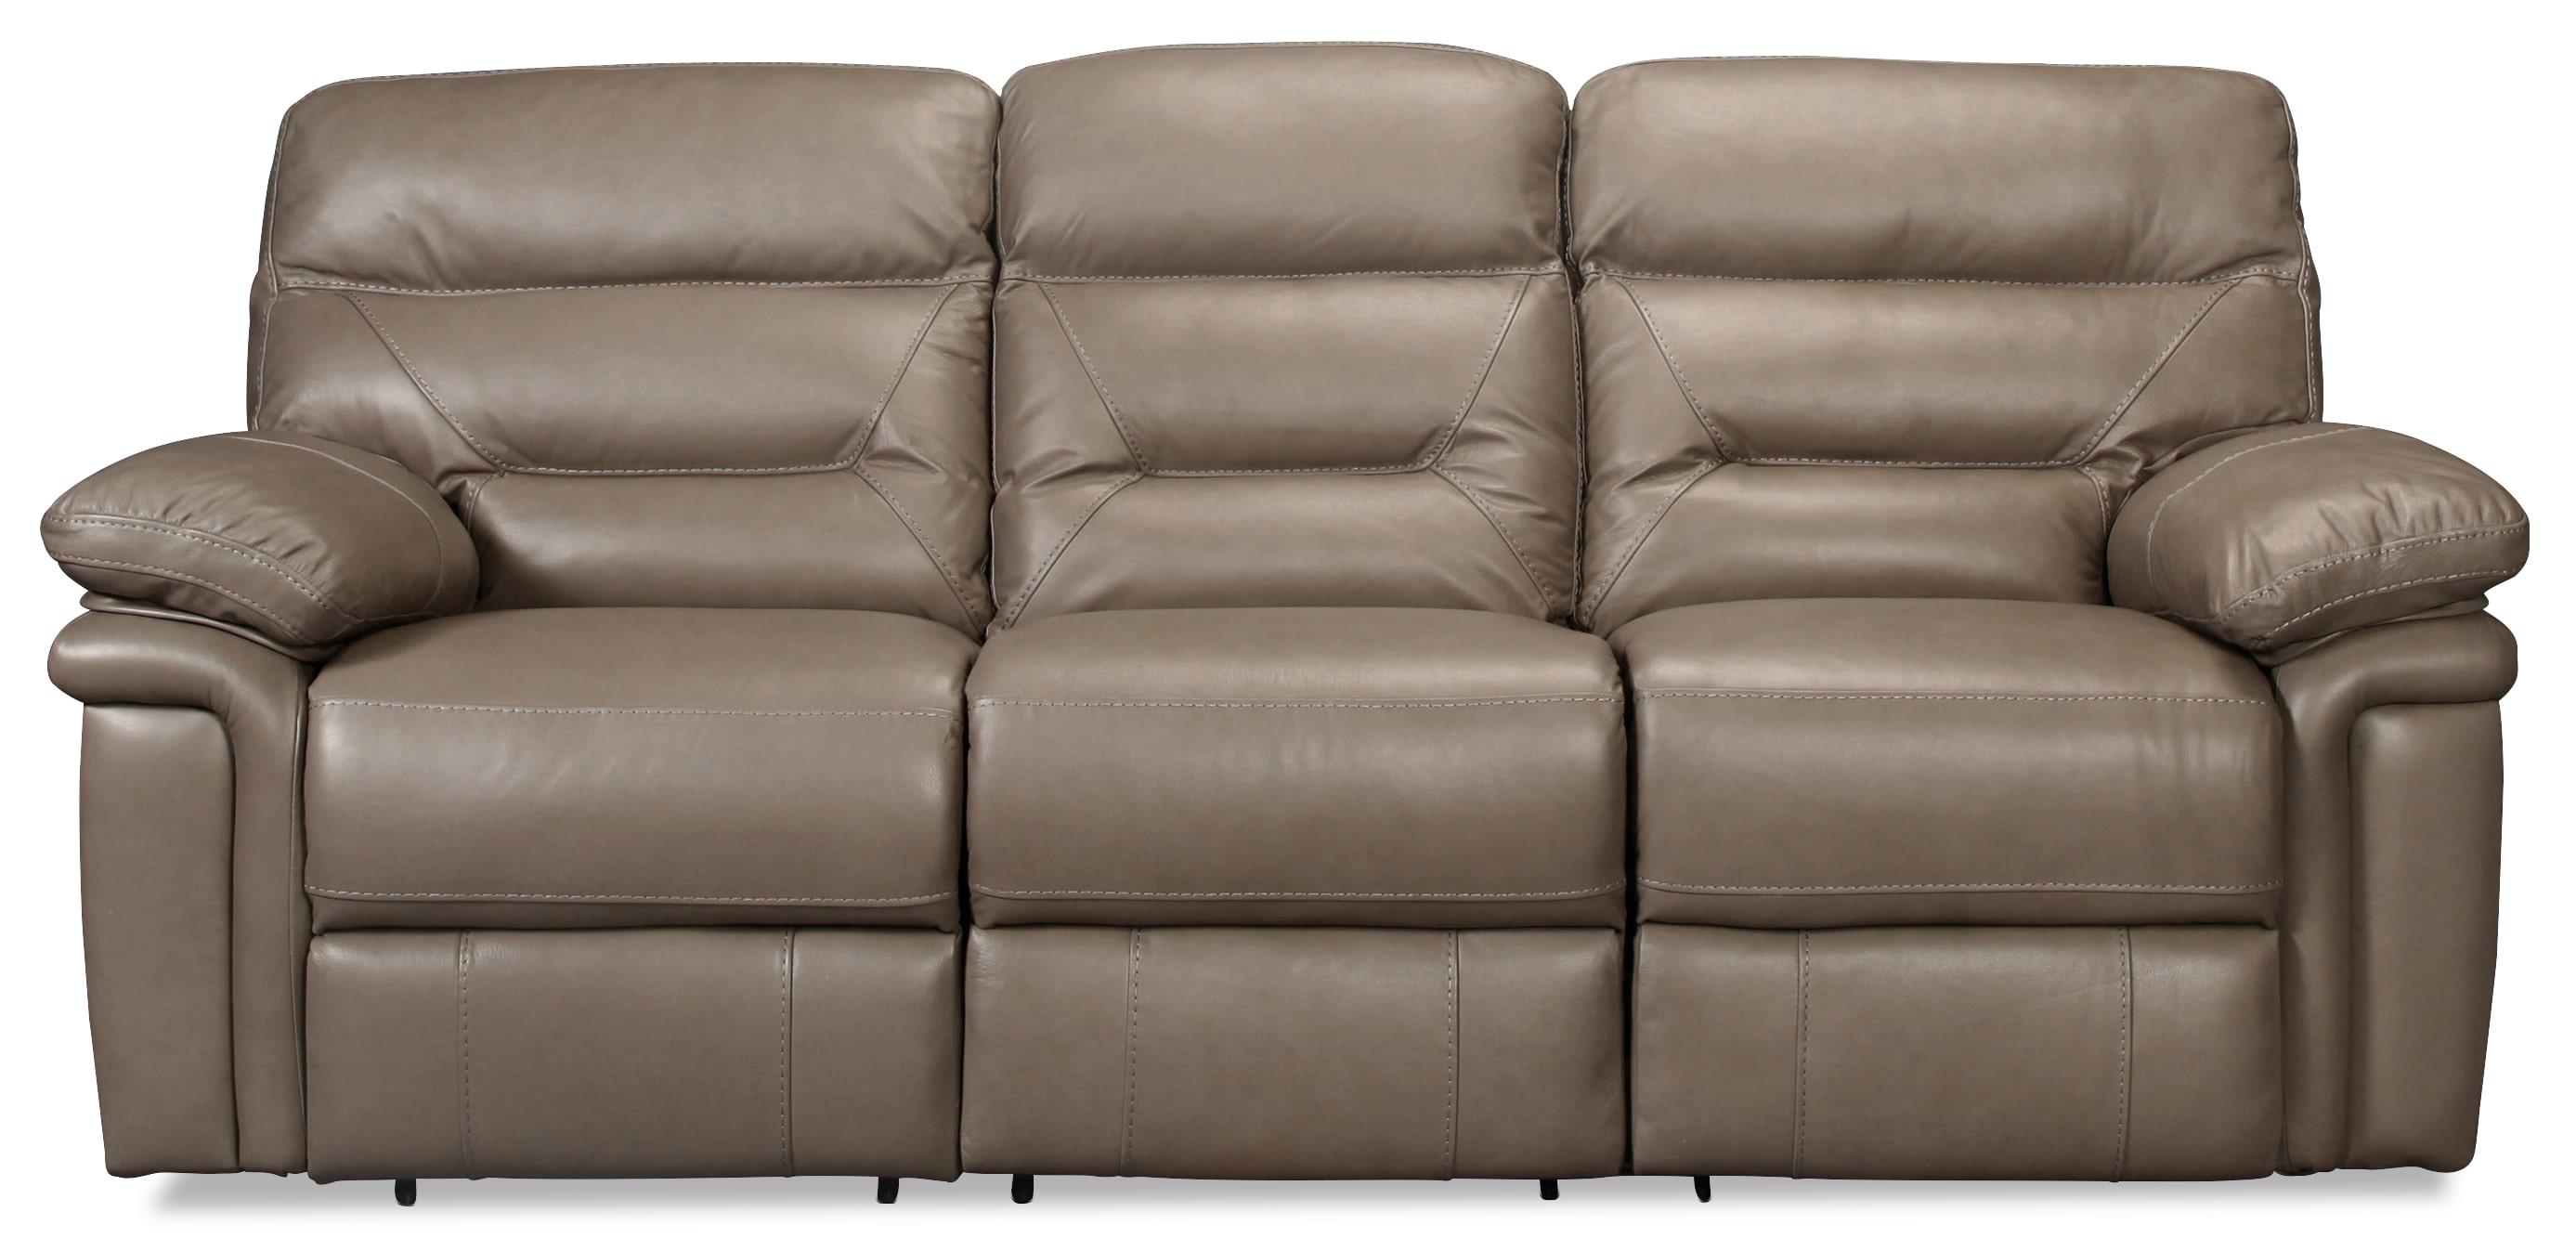 Berkline Reclining Sofas Rs Gold Sofa